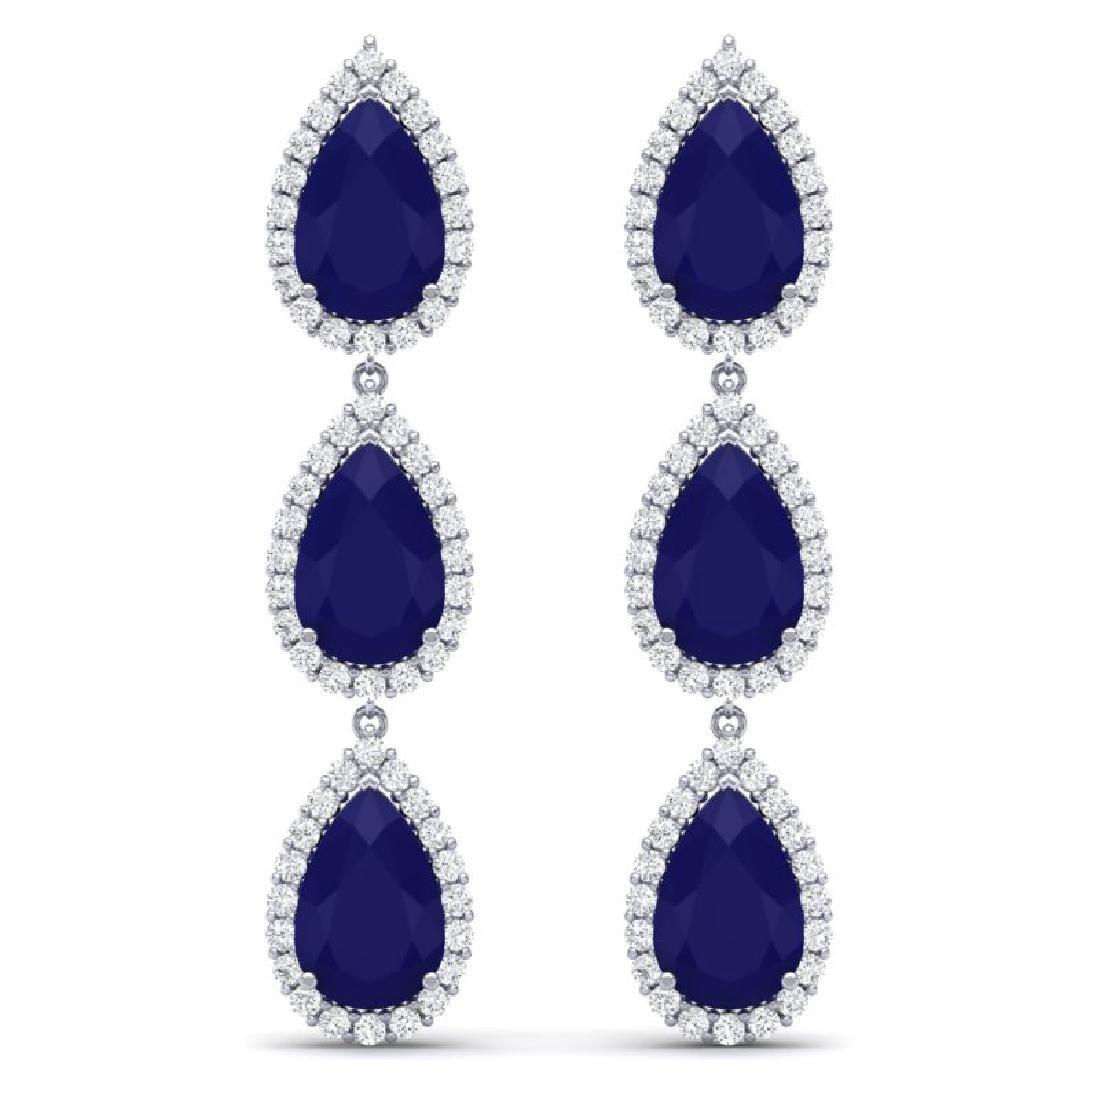 27.06 CTW Royalty Sapphire & VS Diamond Earring 18K